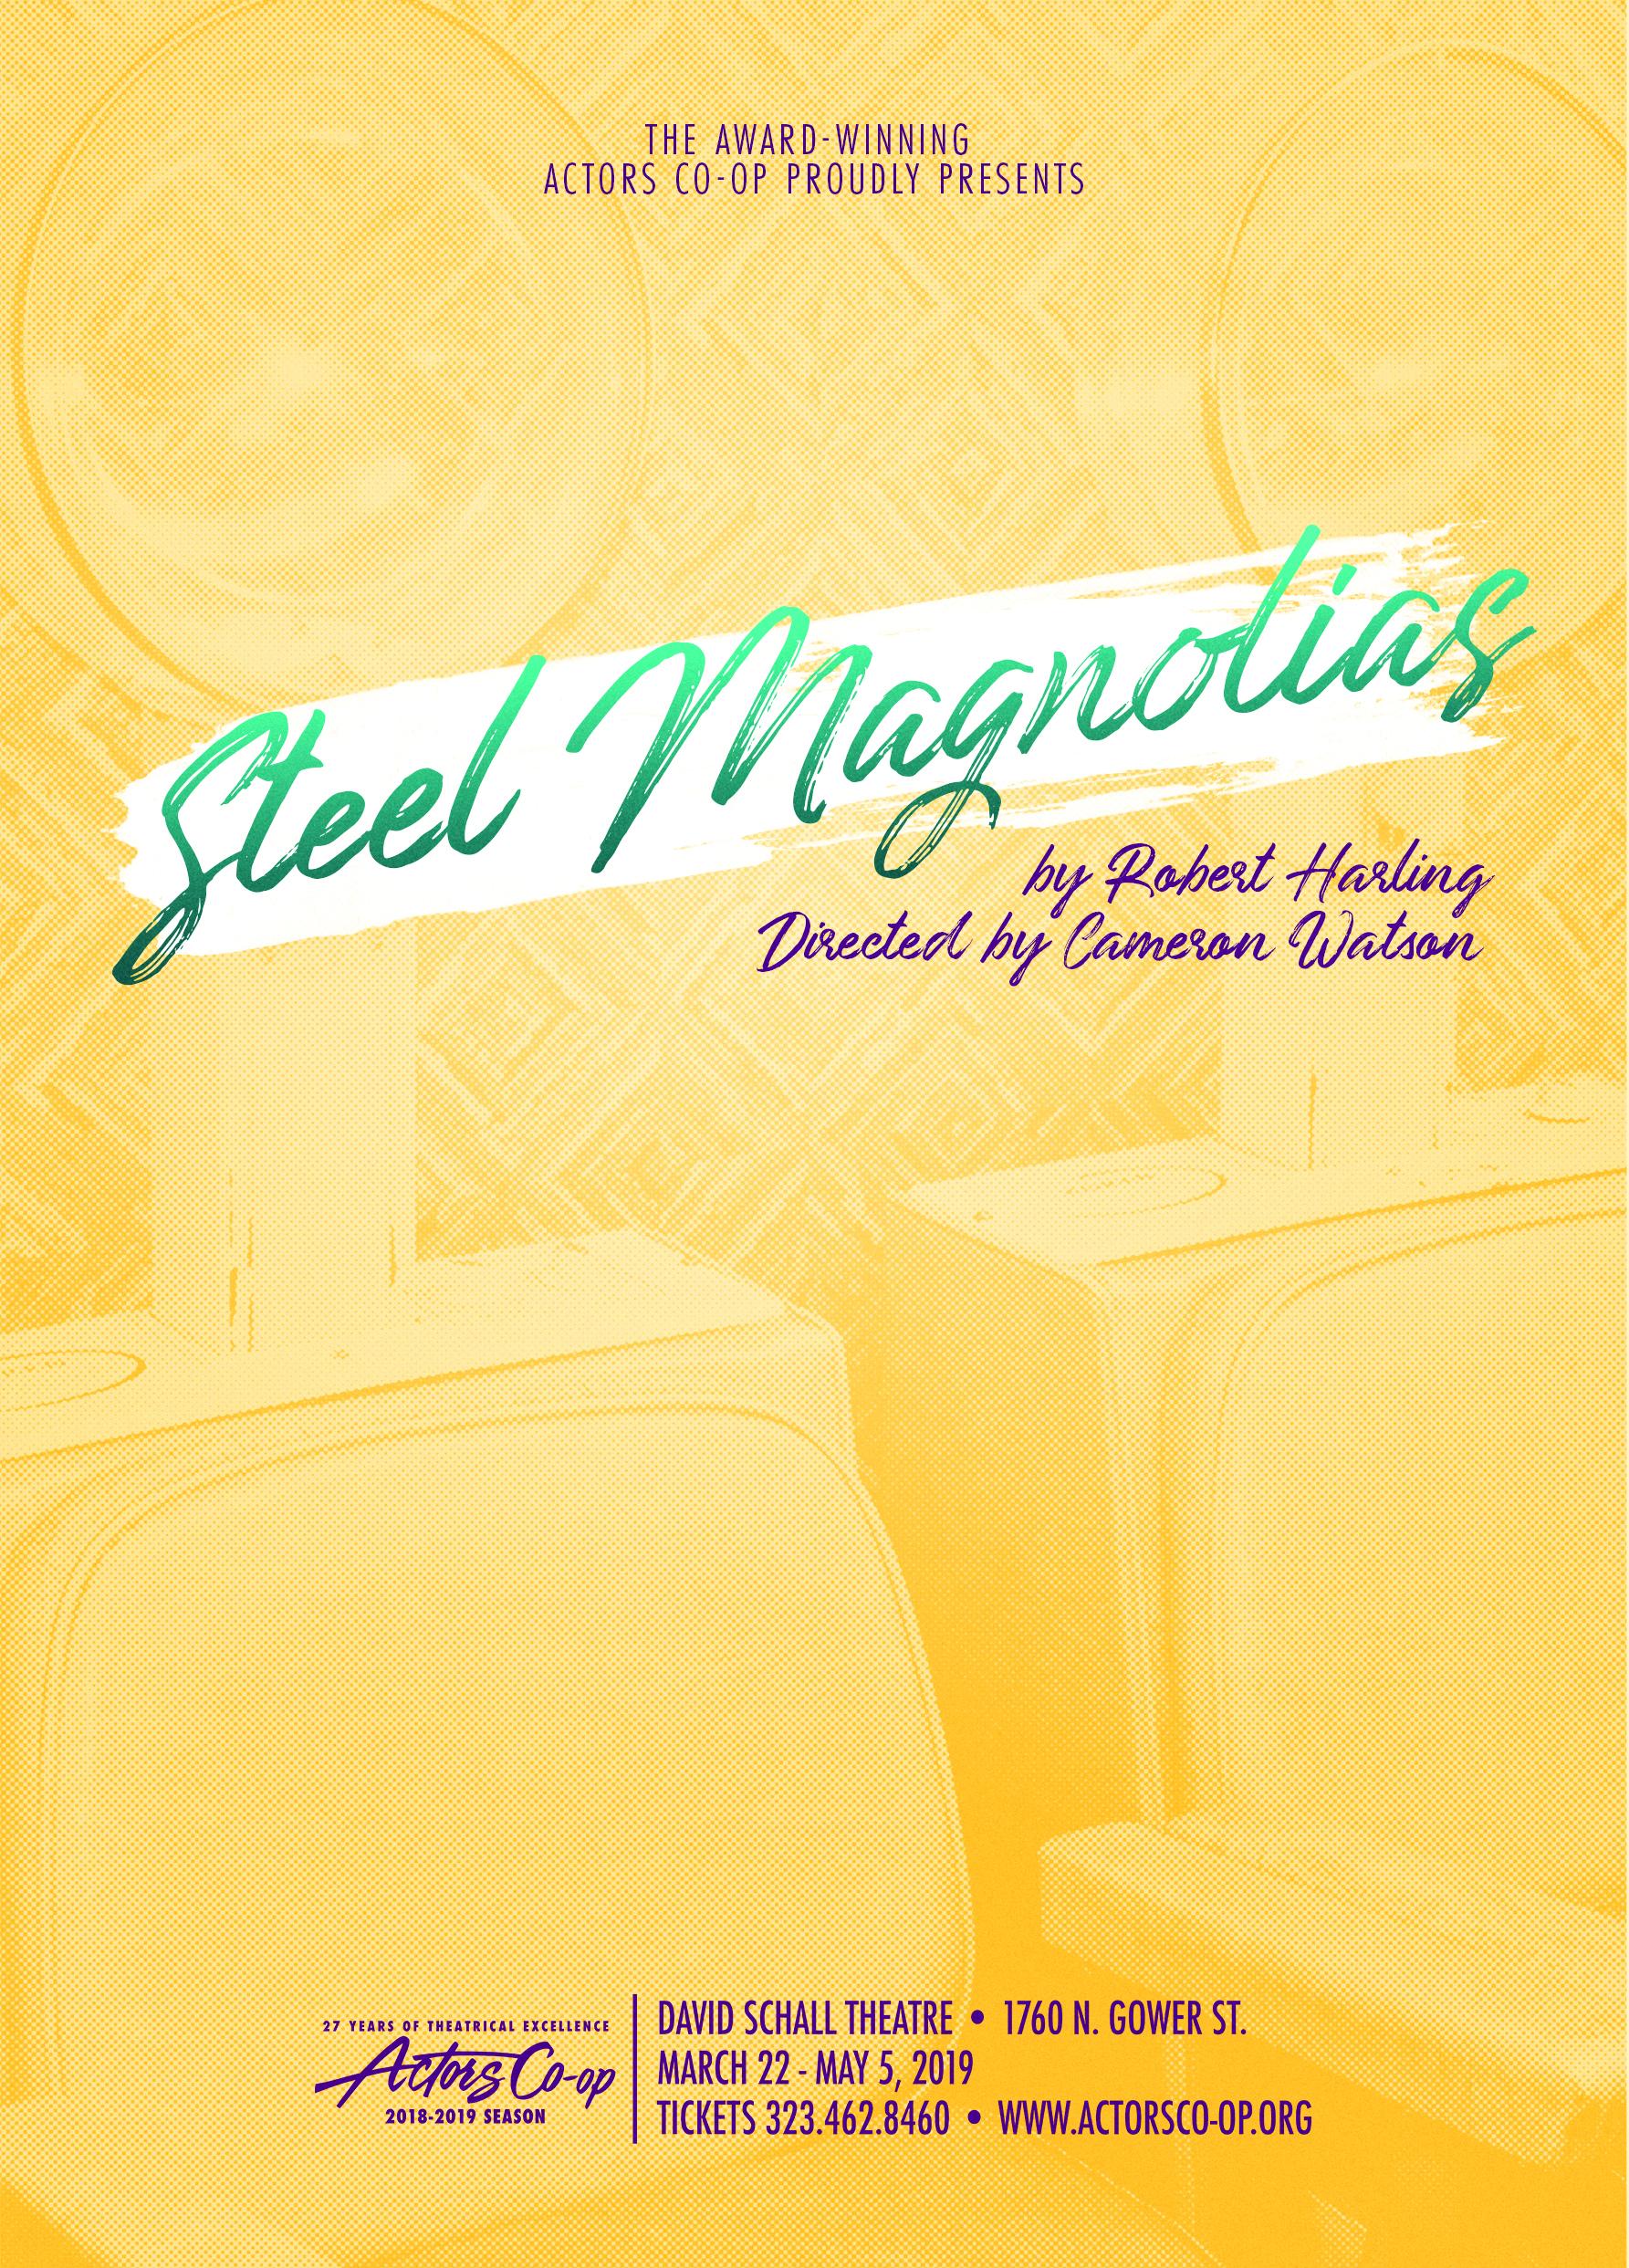 SteelMagnolias_5x7_Front_PRINT.jpg